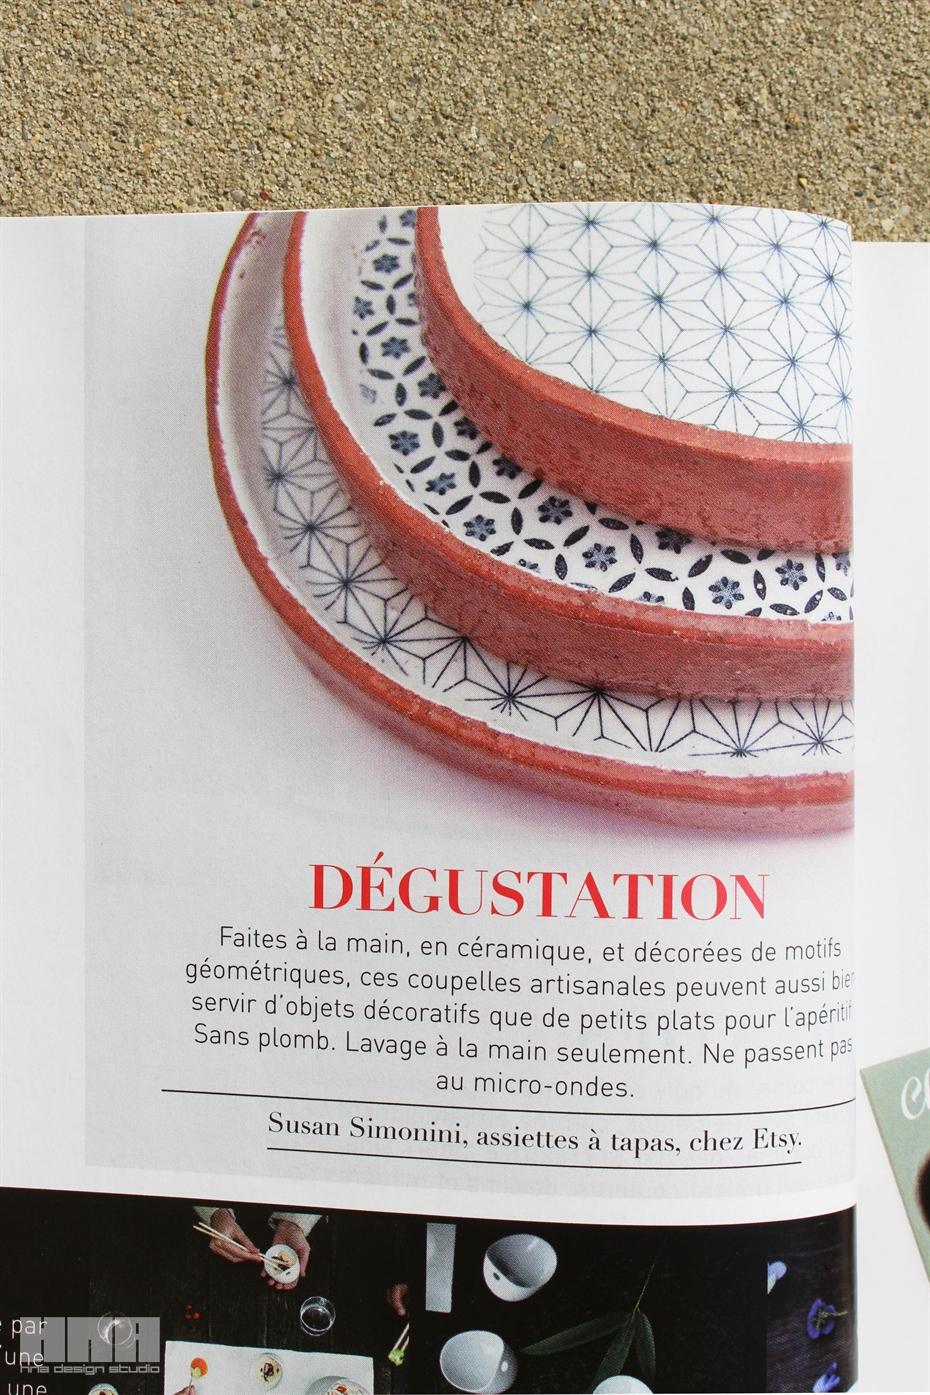 hna design cuisines and bains 2014 november december 5